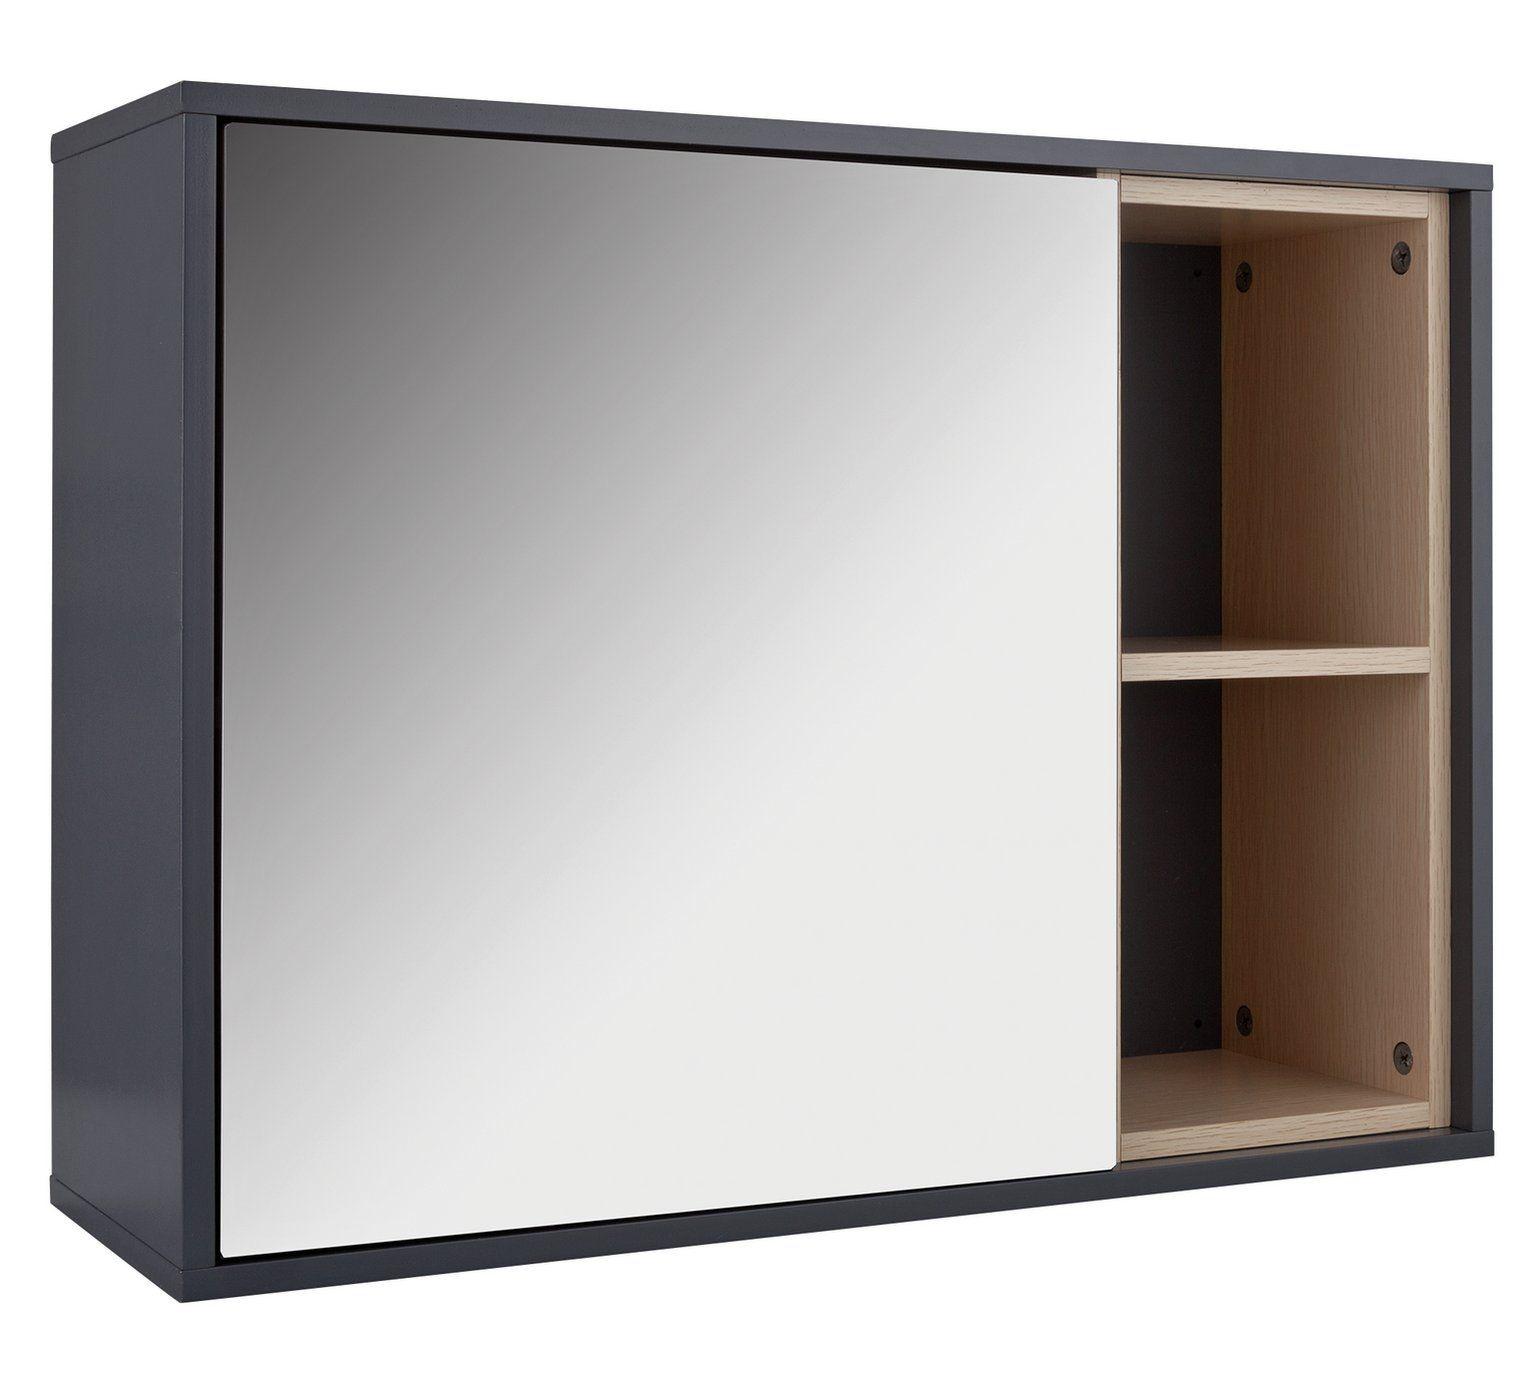 Buy Hygena 1 Door Mirrored Wall Cabinet Grey At Argos Co Uk Visit Argos Co Uk To Shop Online For Bathroom Cabinets Bathroom Furniture Home And Bathroom